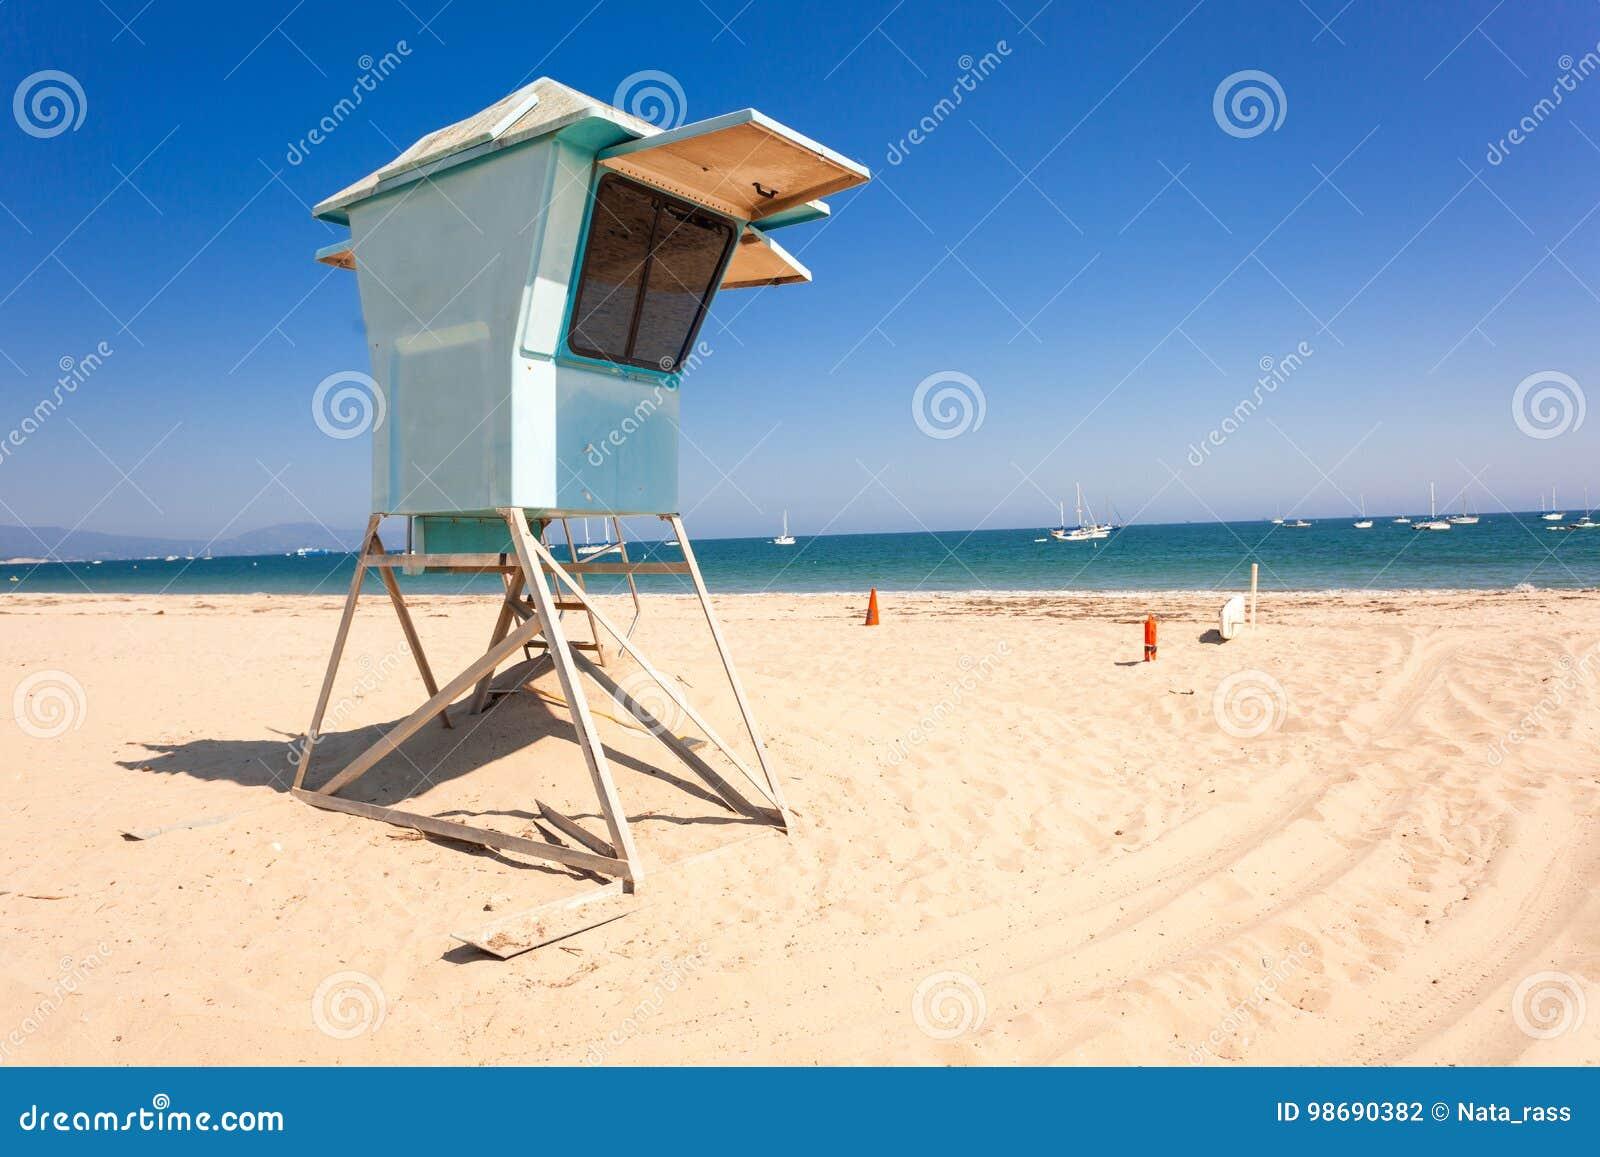 Lifeguard hut on Santa Barbara beach